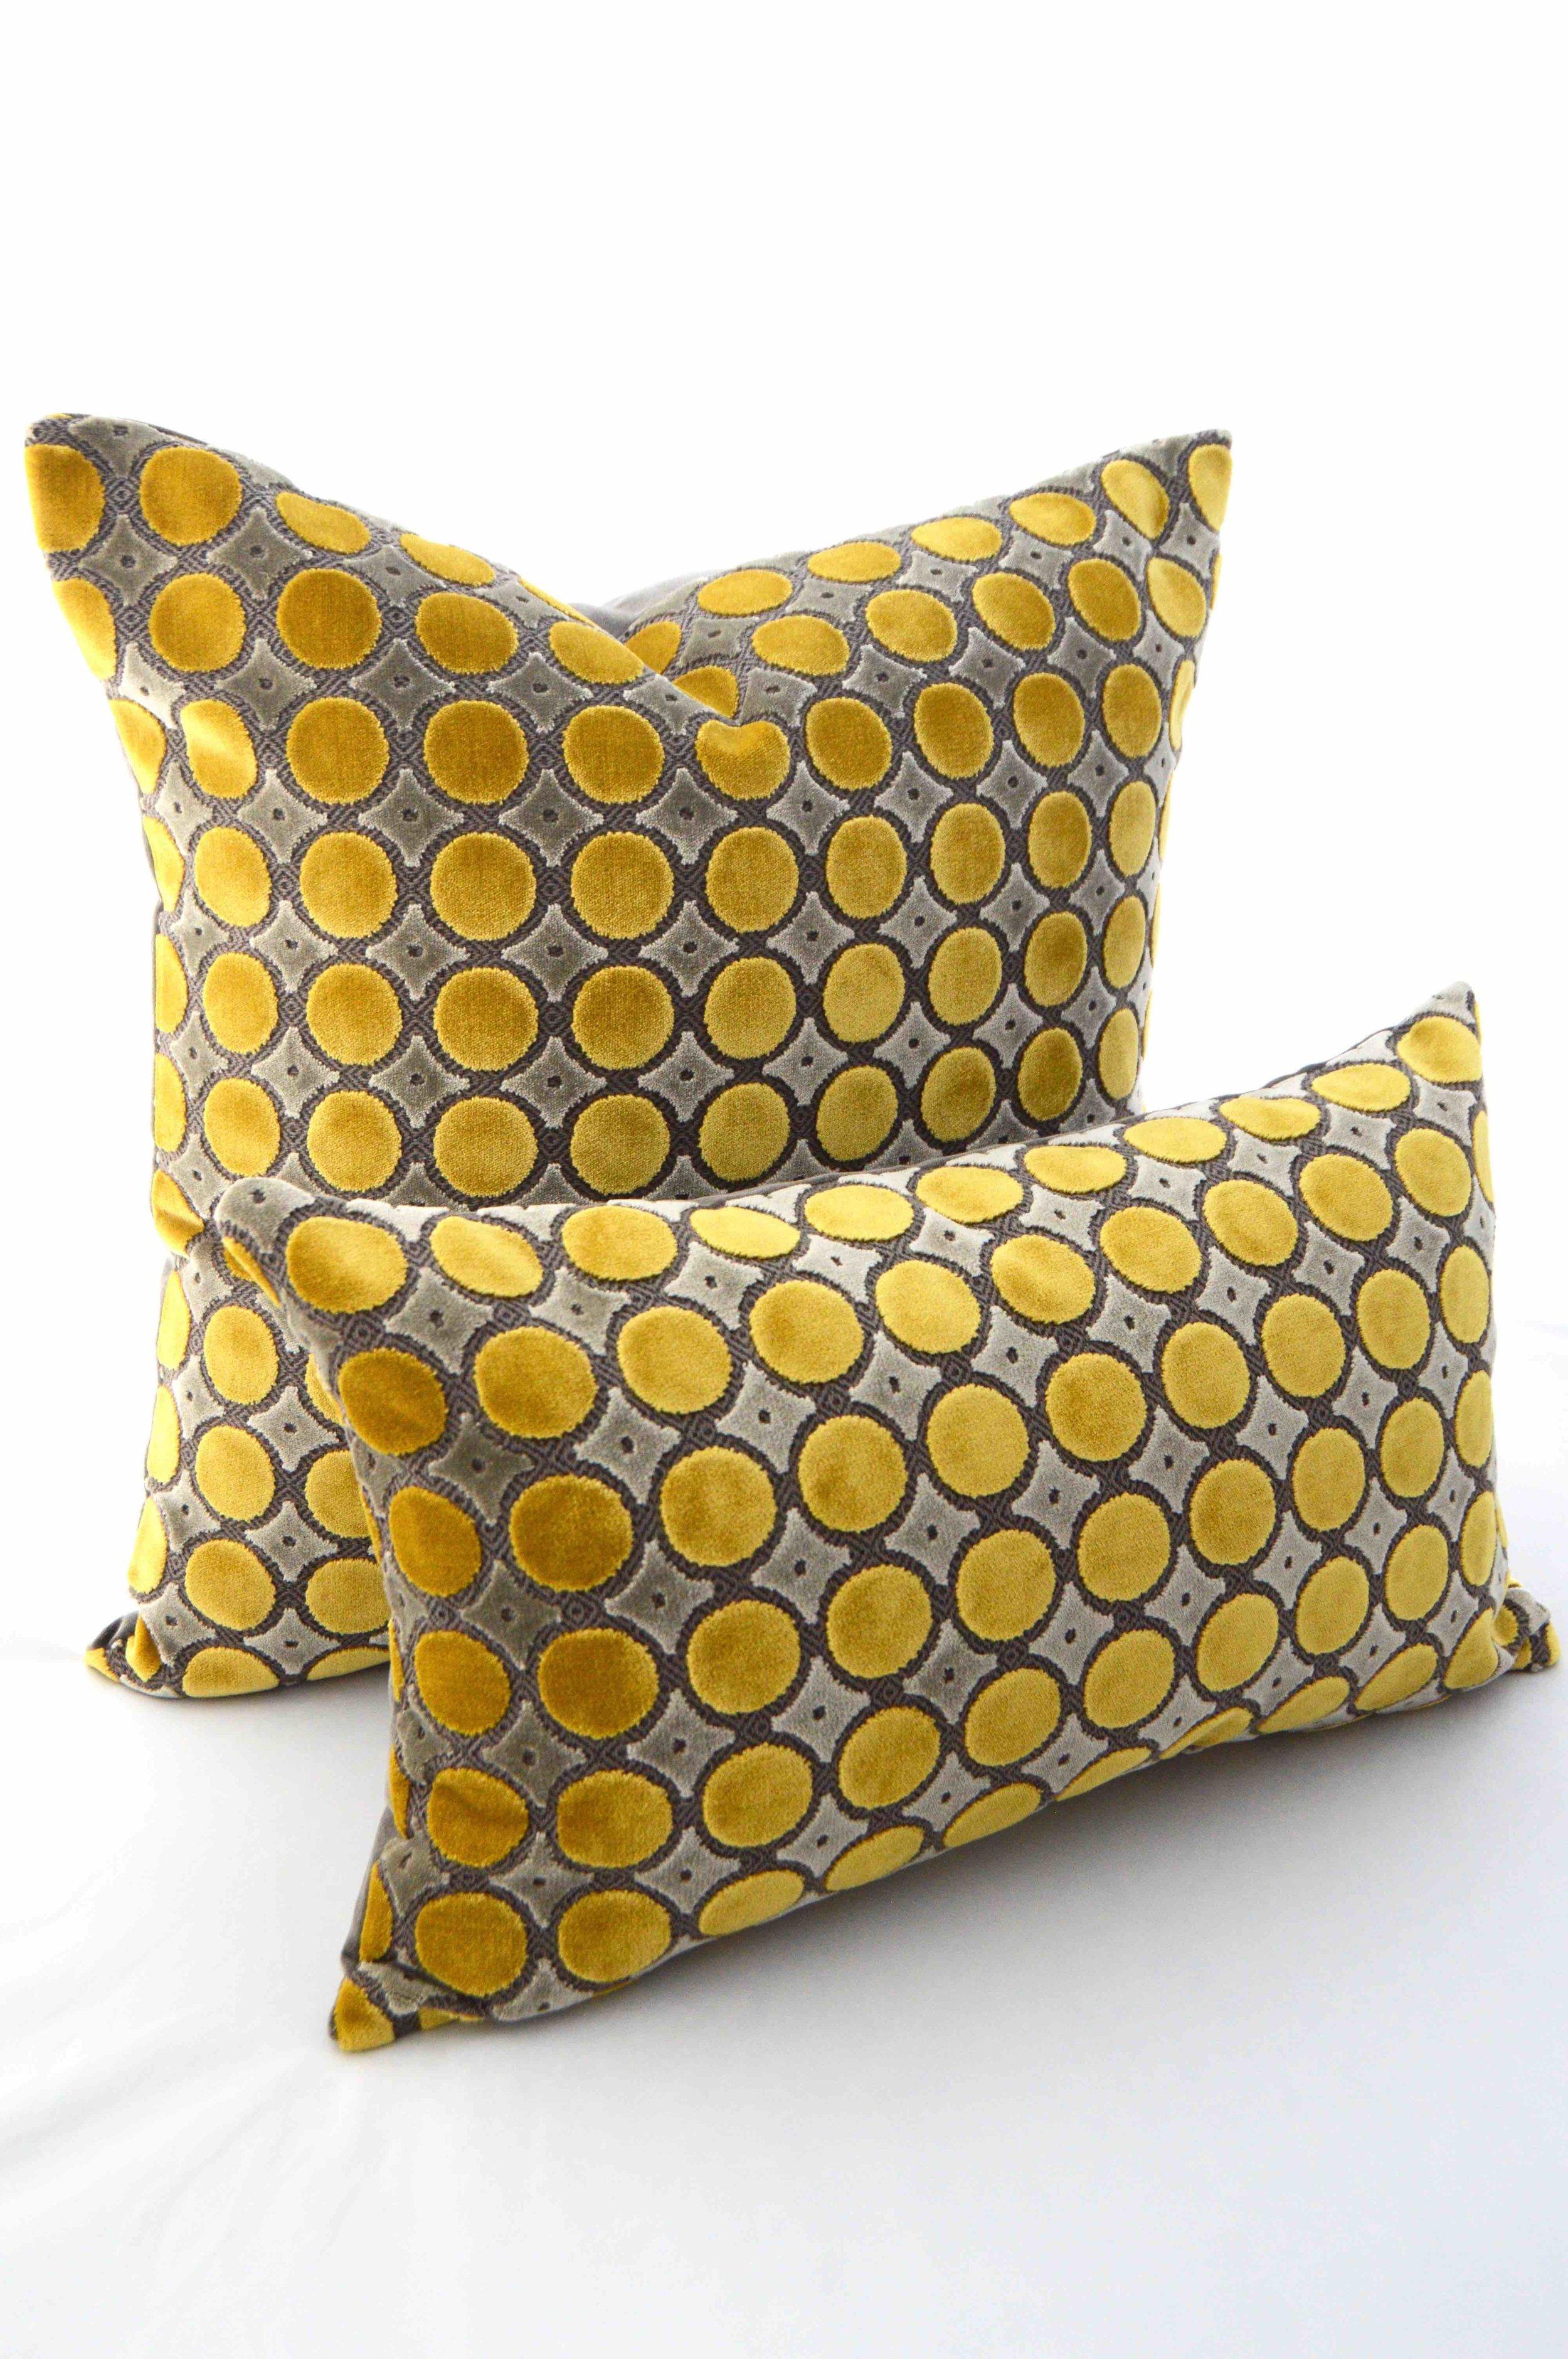 yellow and gray luxurious polka dot velvet pillow firmamenta